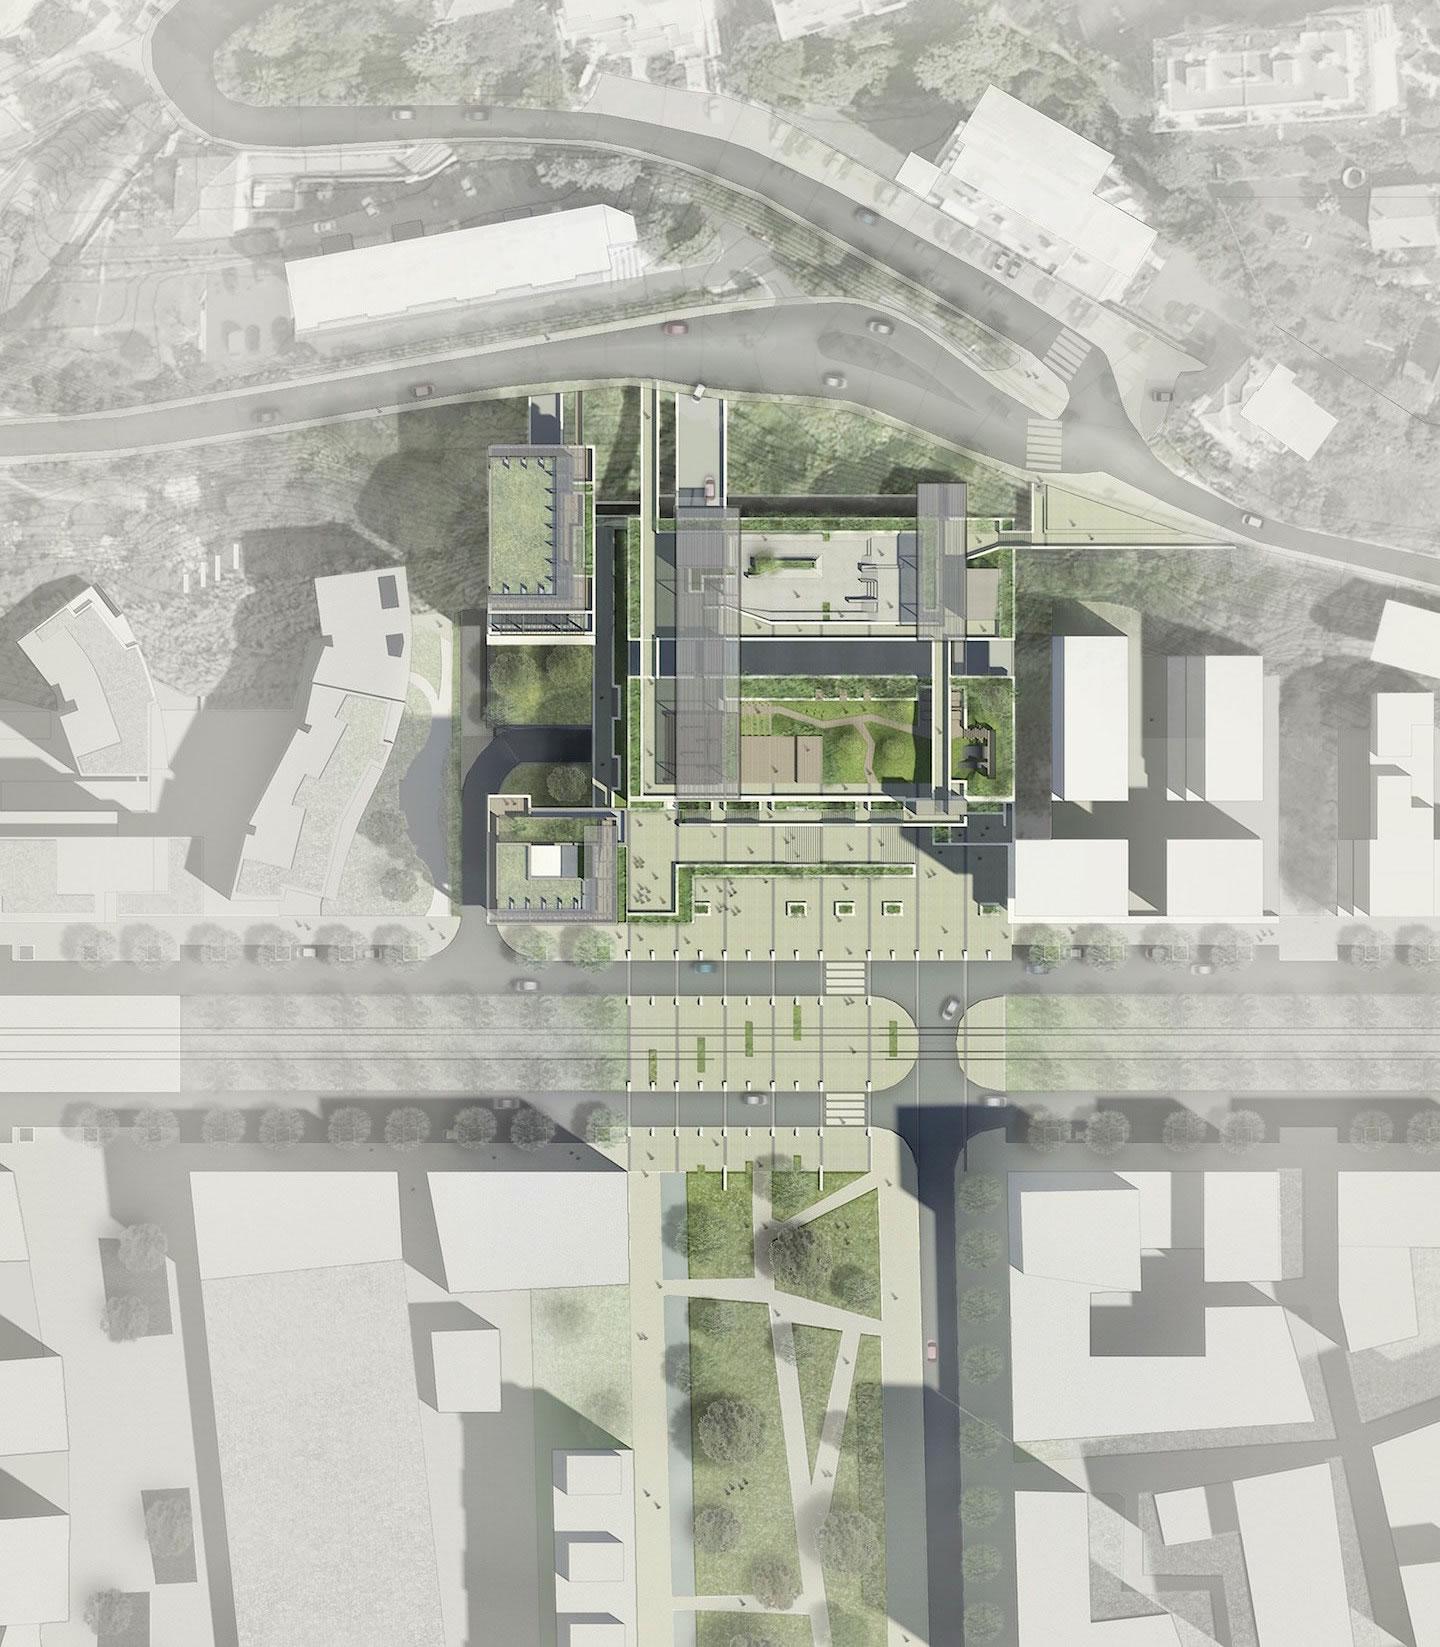 christophe-benichou-architectures-ville-colline-nice-meridia-13